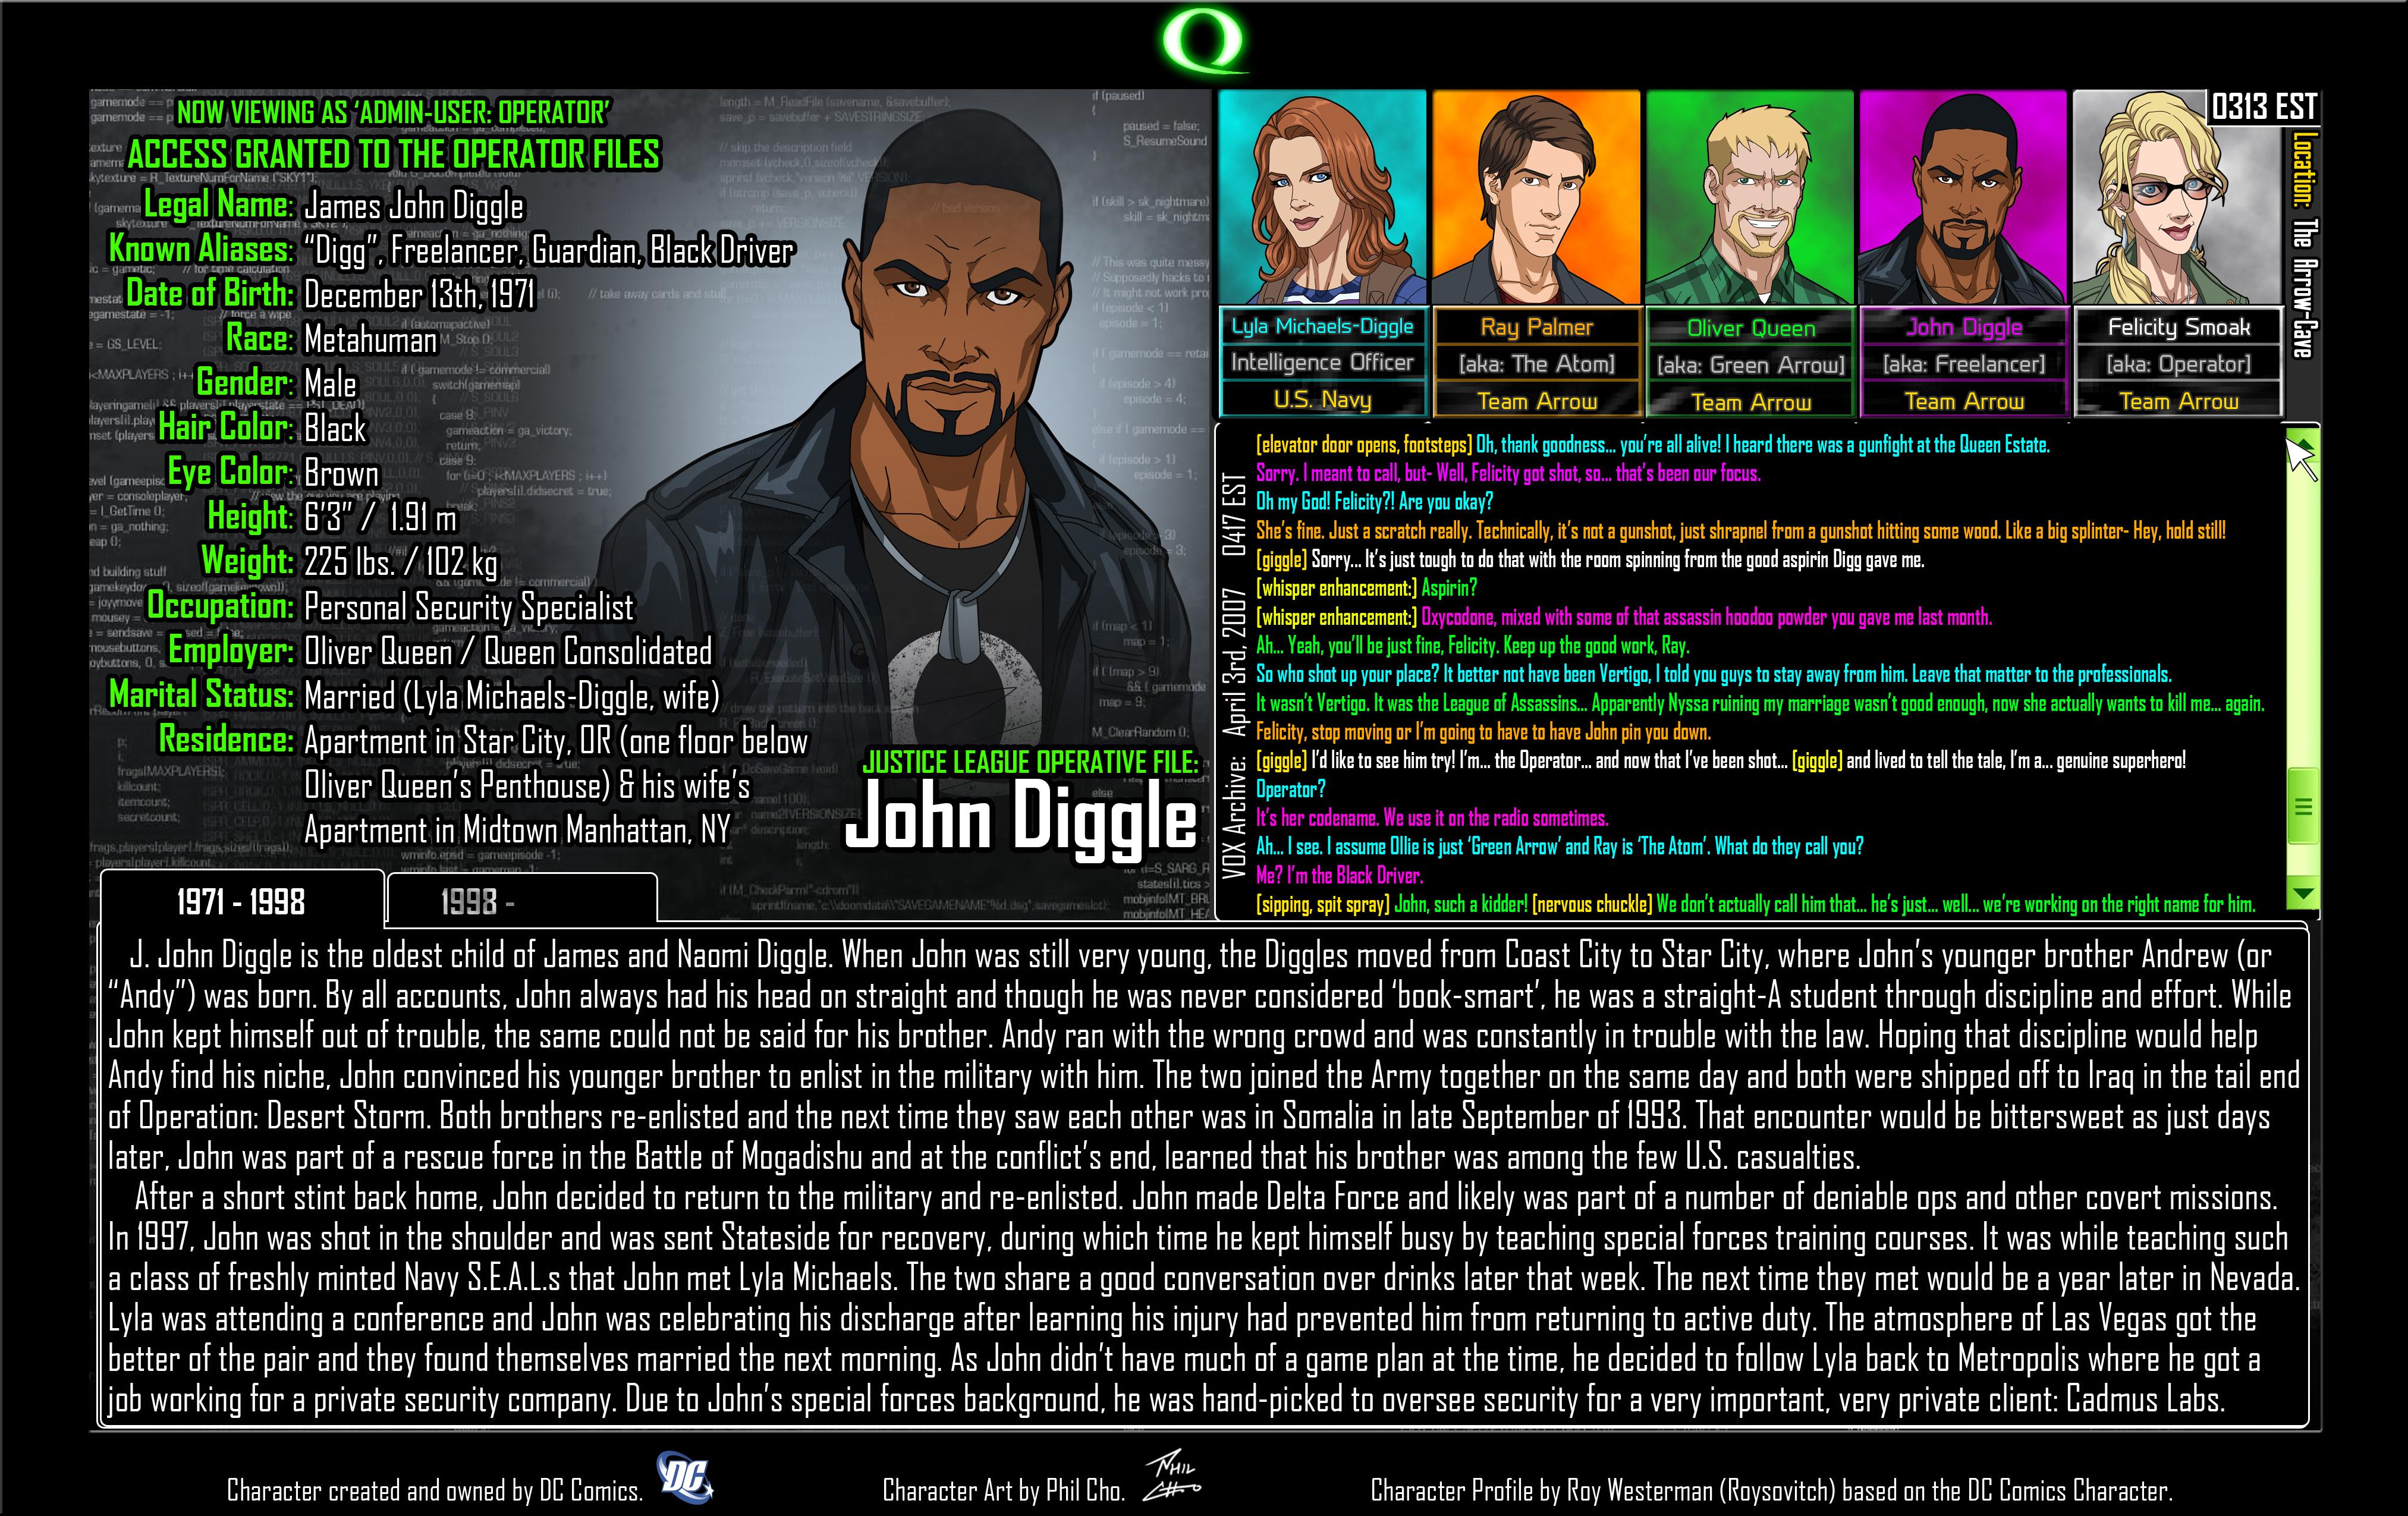 Operator Files: John Diggle 1